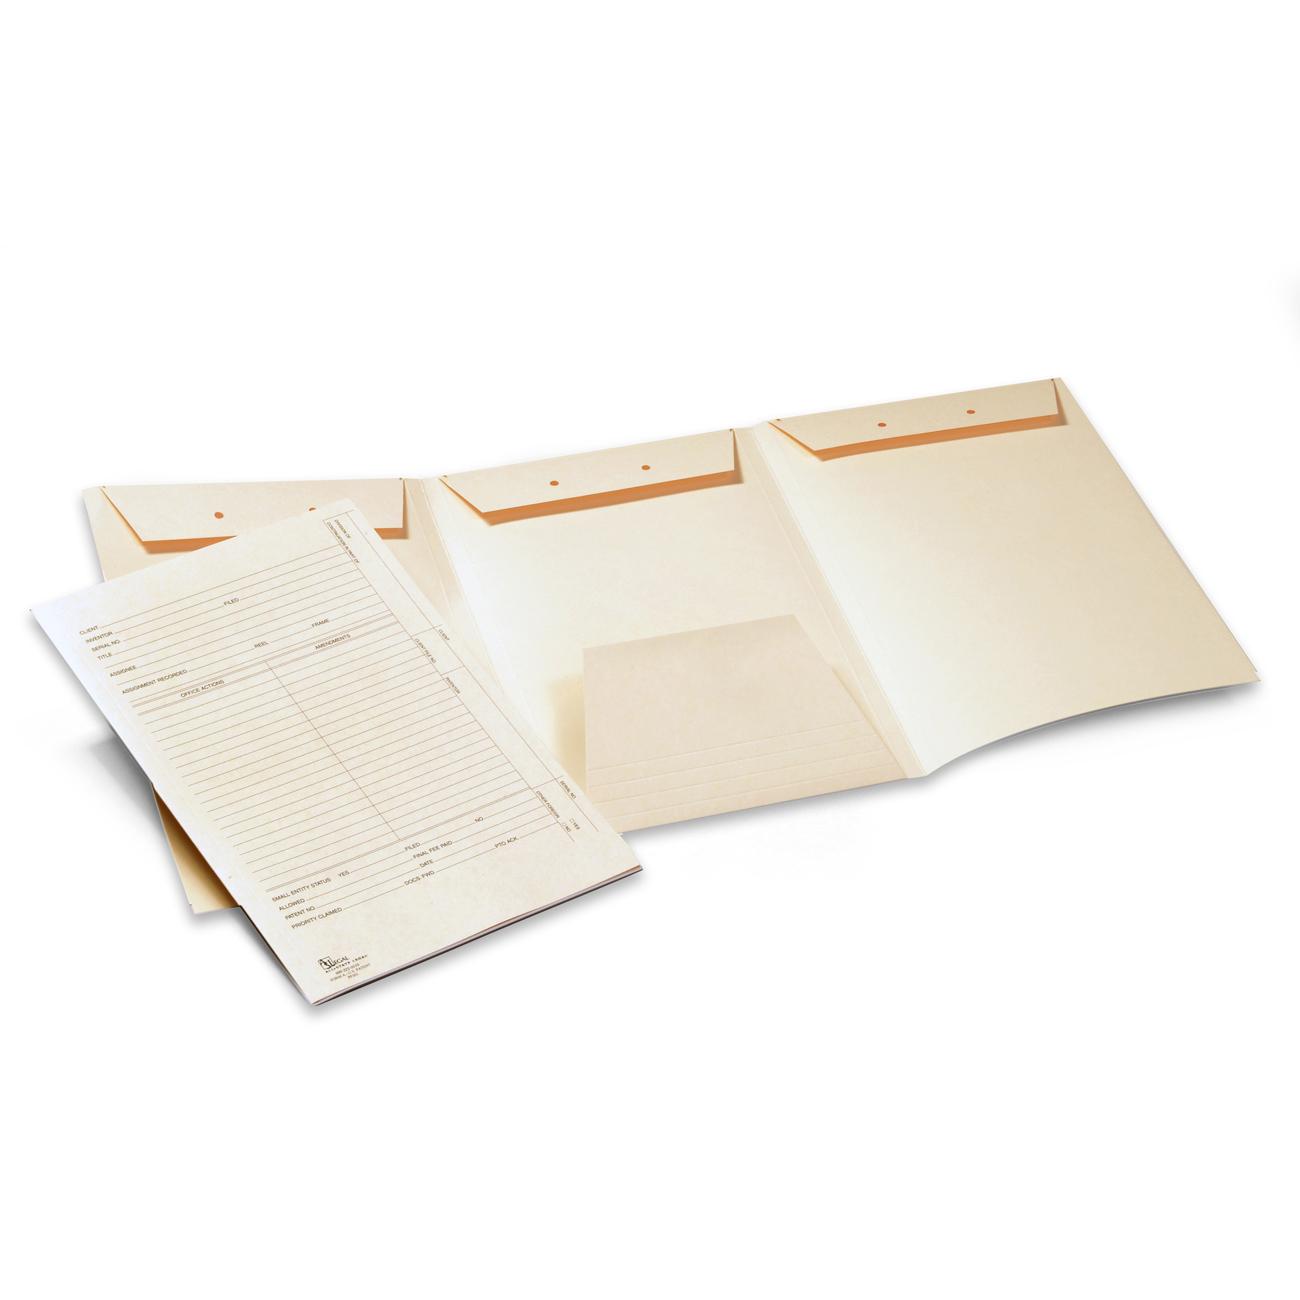 Intellectual Property Folders, Patent Application